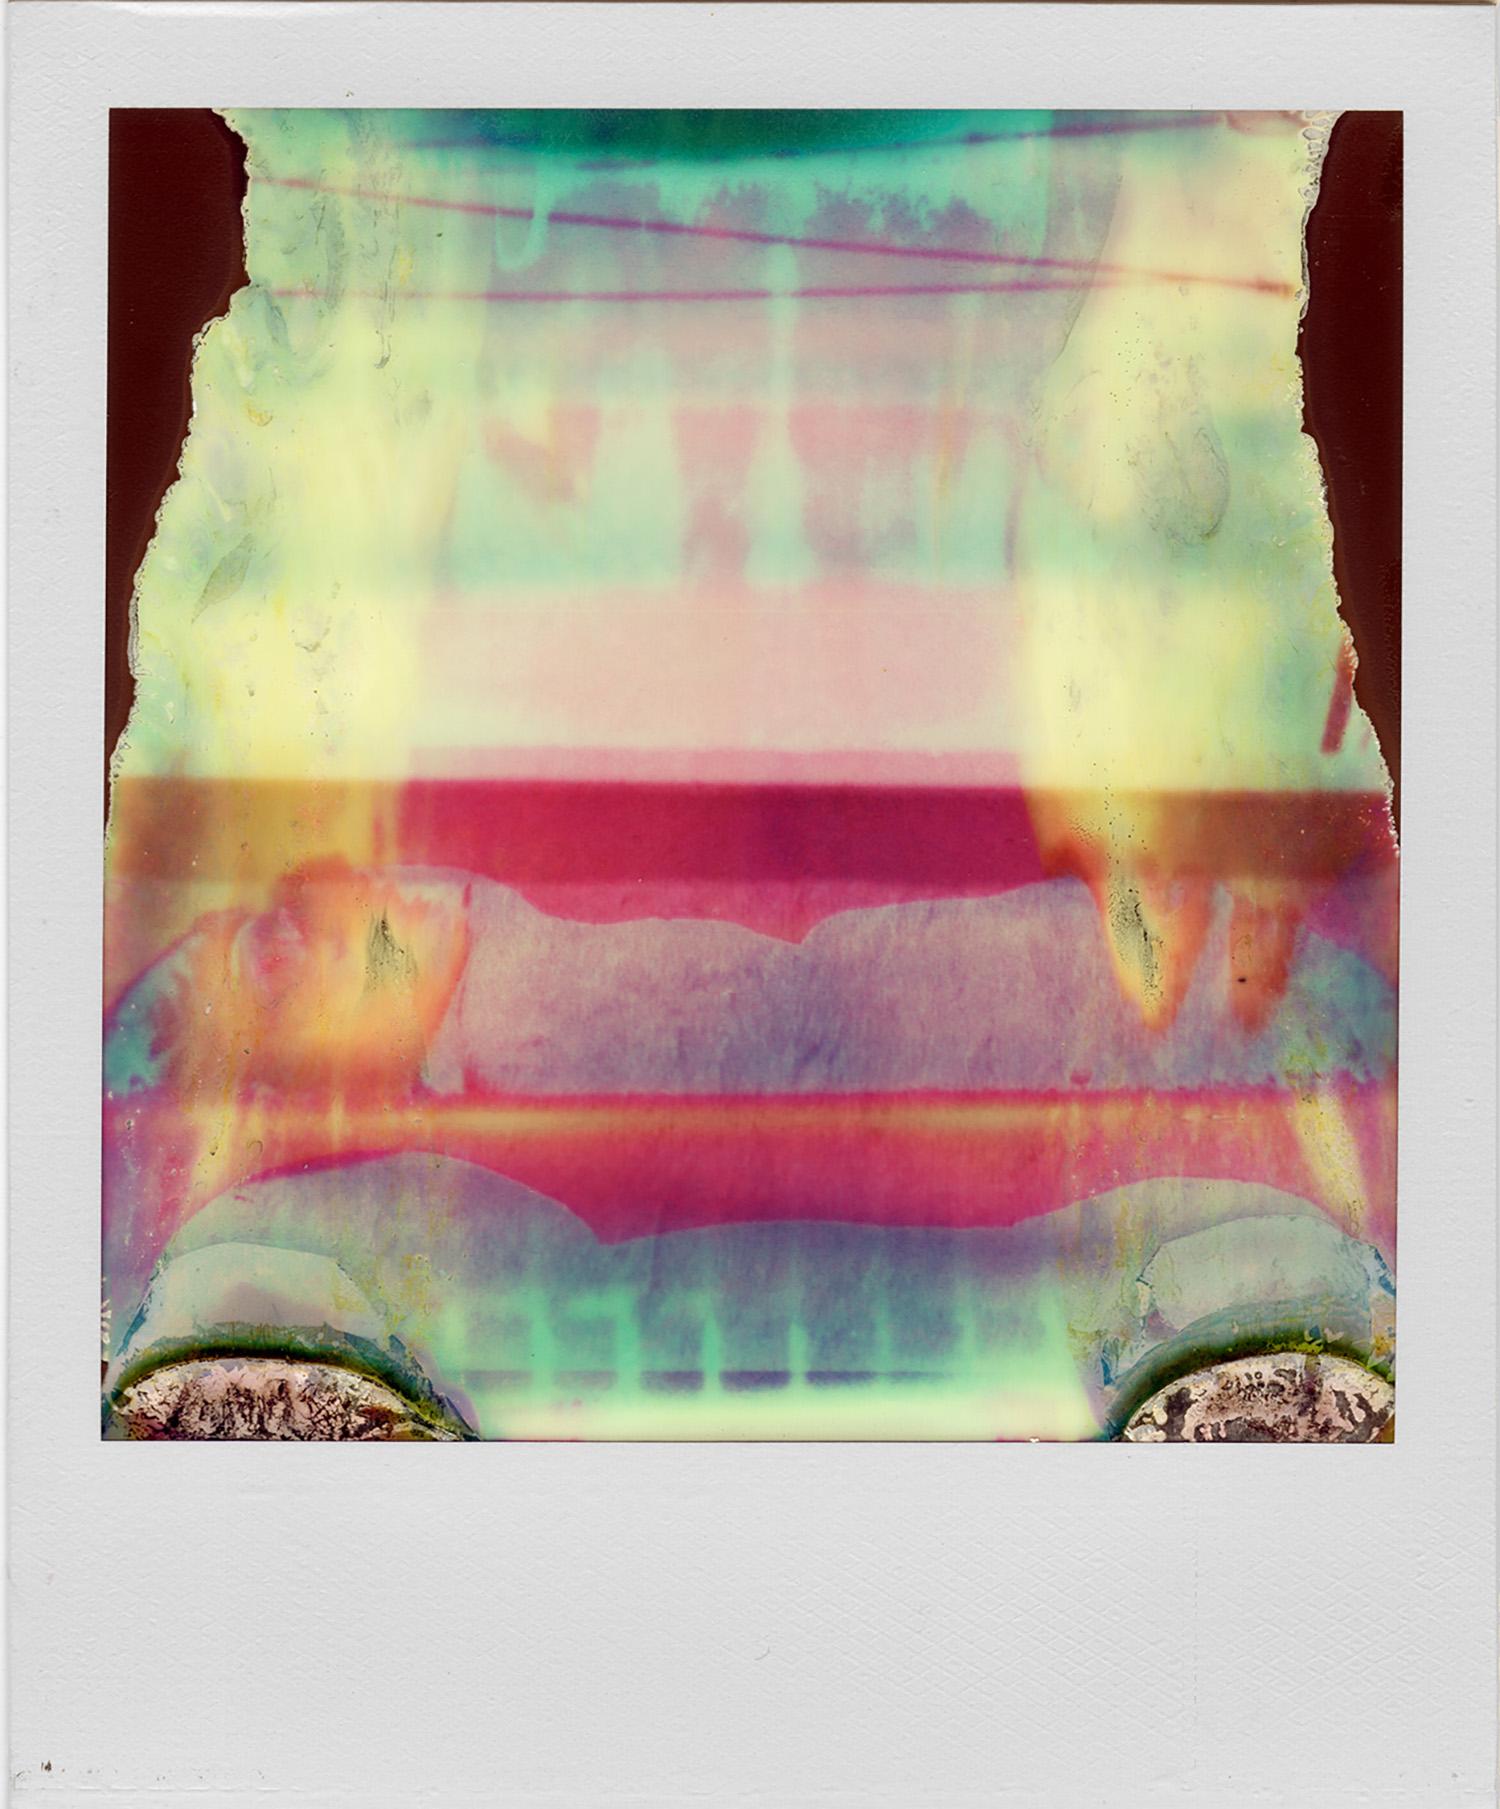 Ruined Polaroid #21, 2011